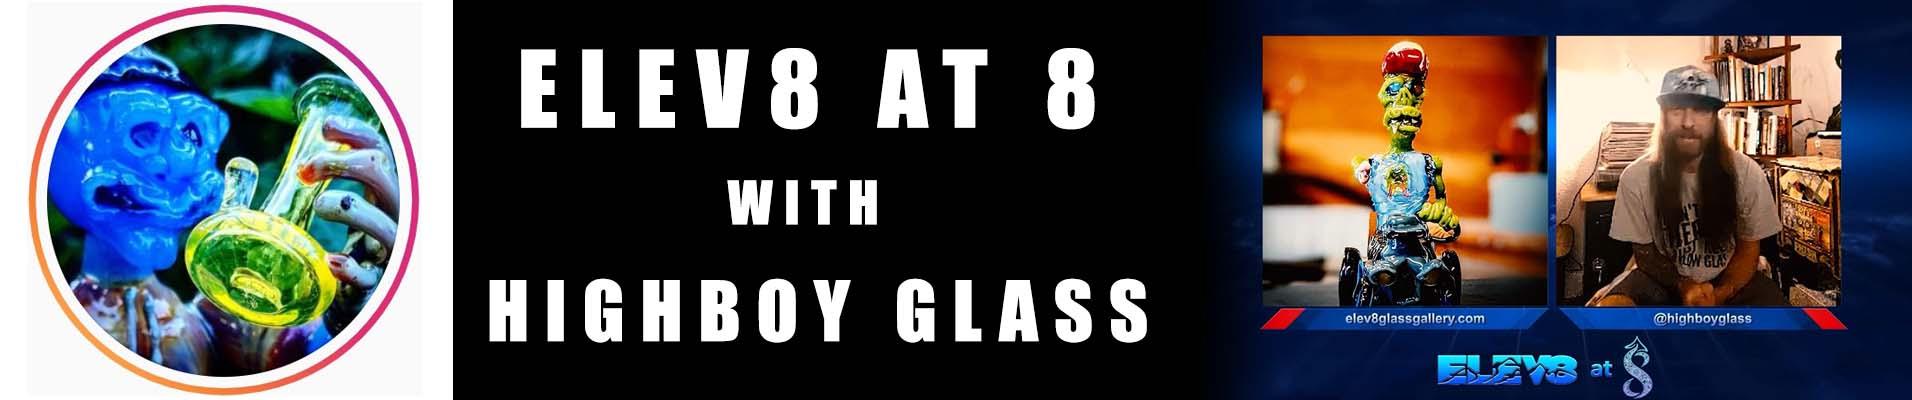 highboy-glass-elev8-at-8-banner.jpg